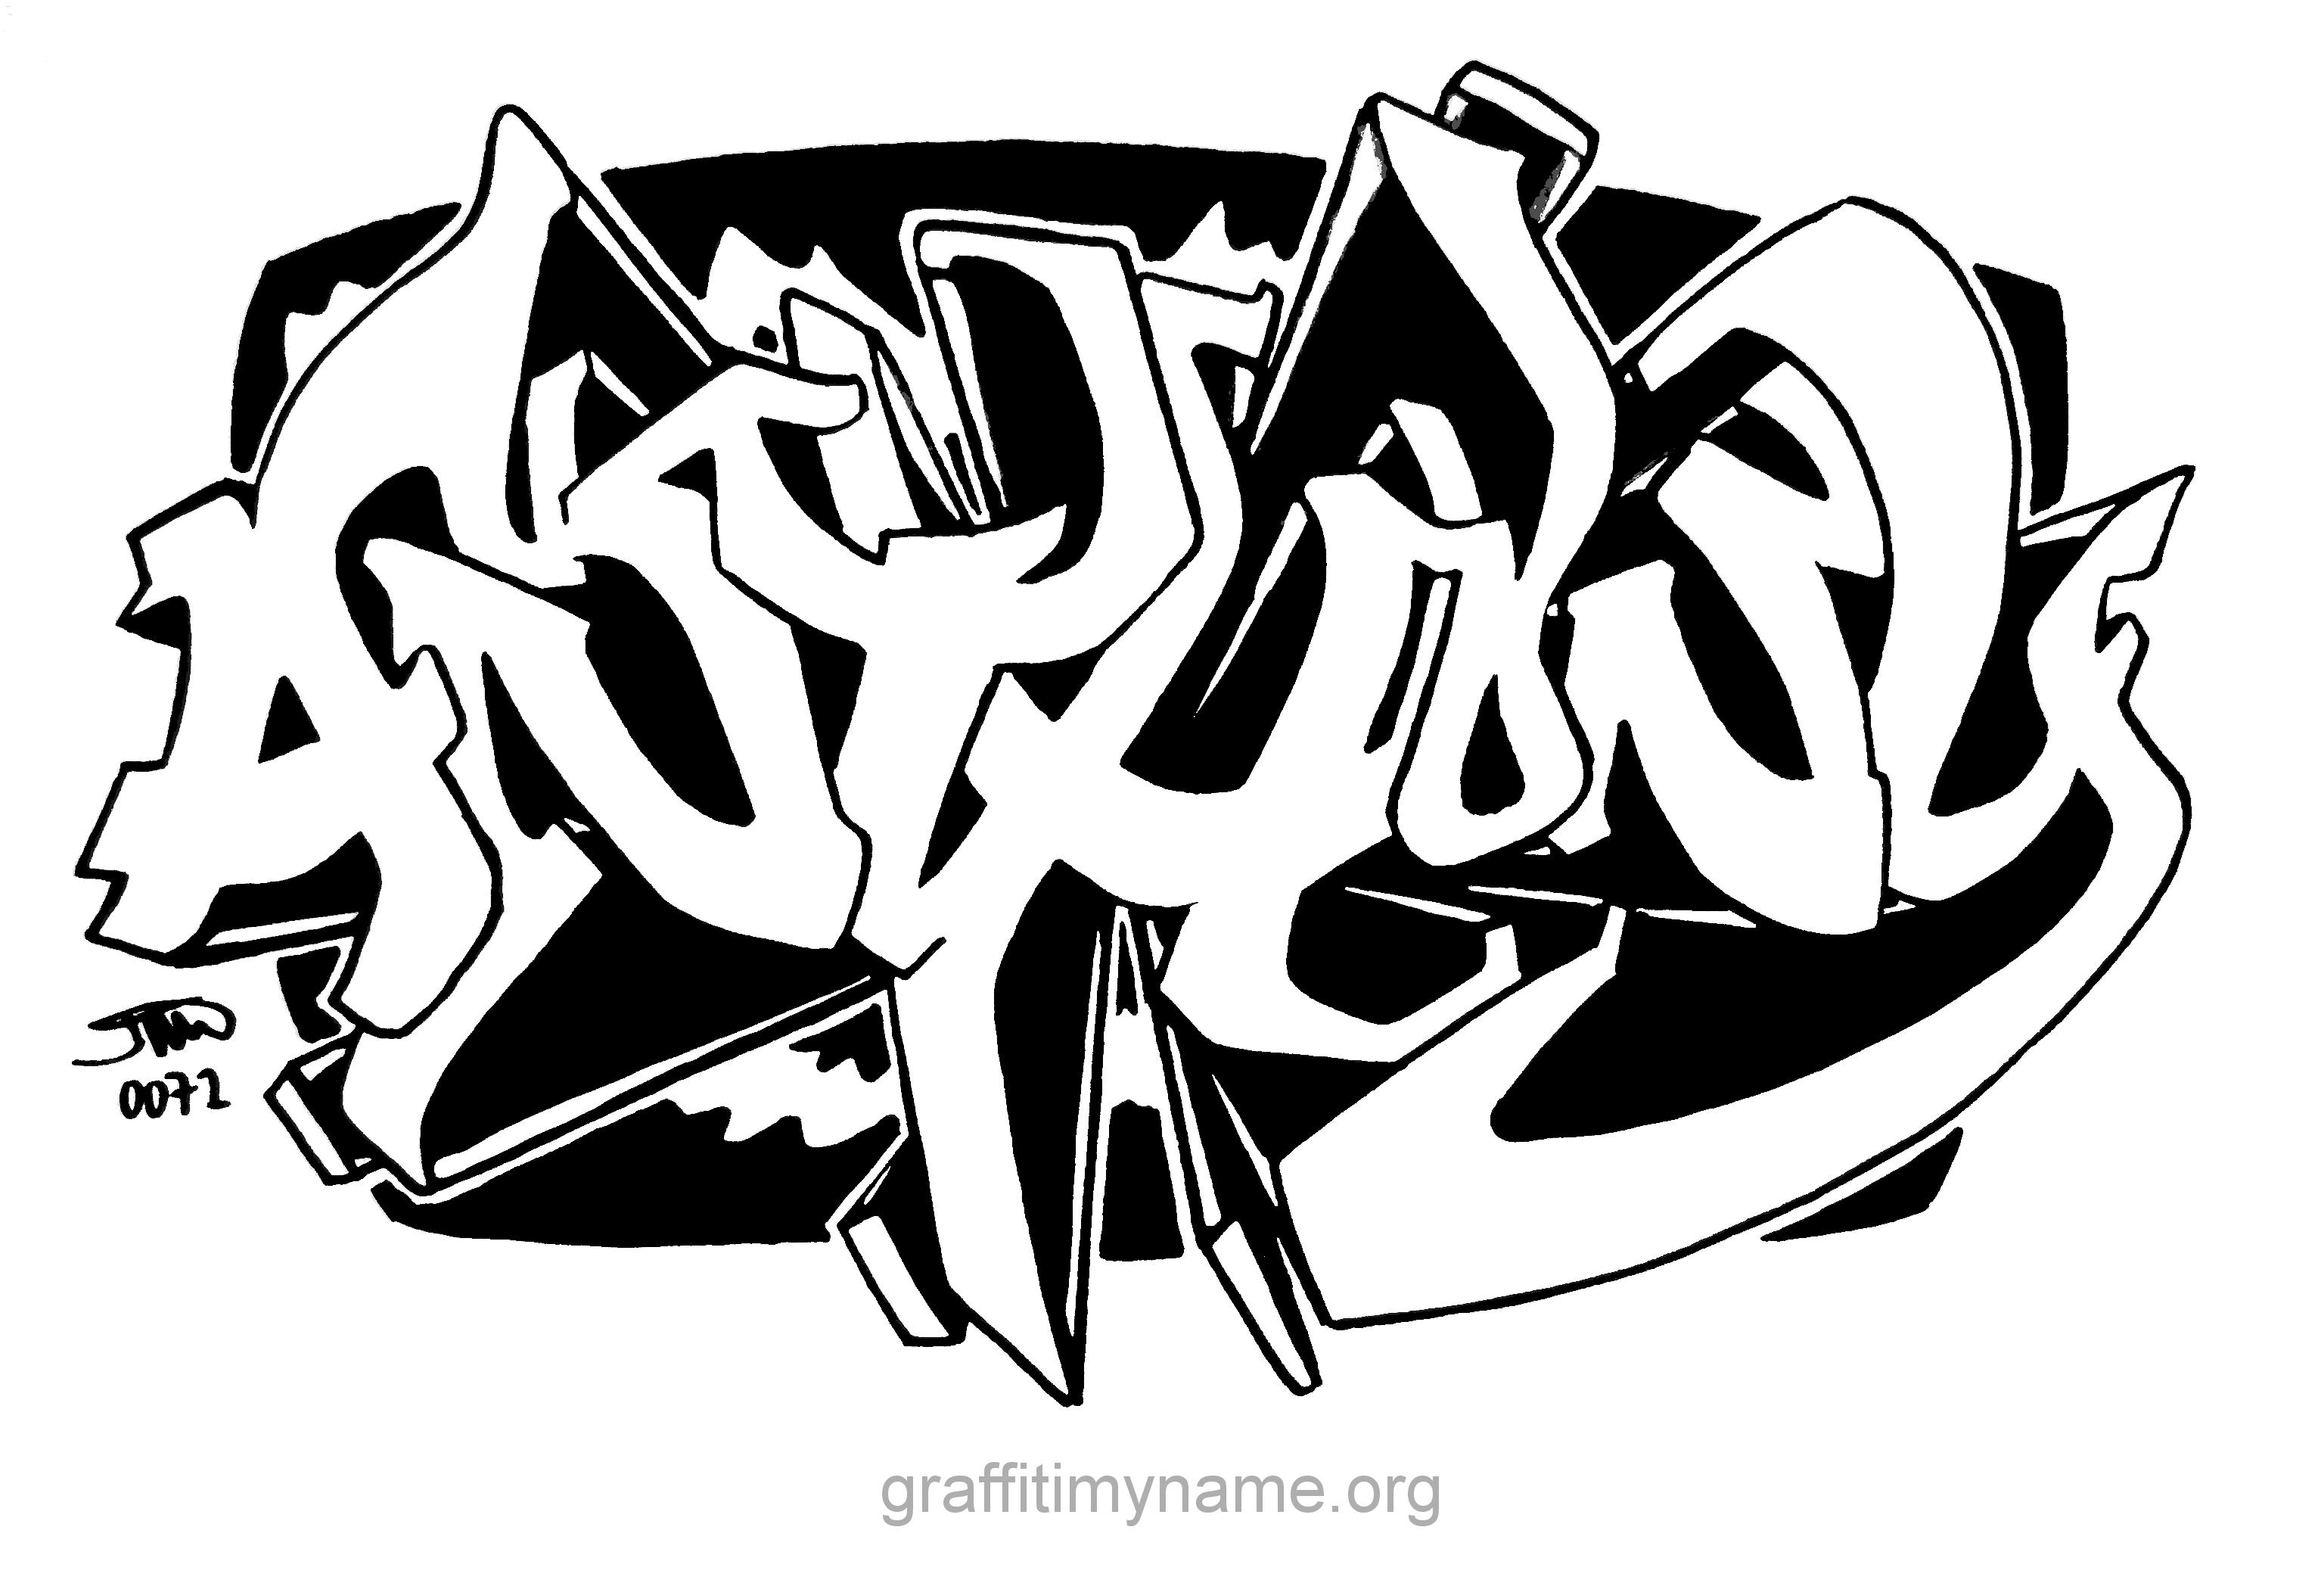 Drawn randome graffiti Hand things  hand Pinterest